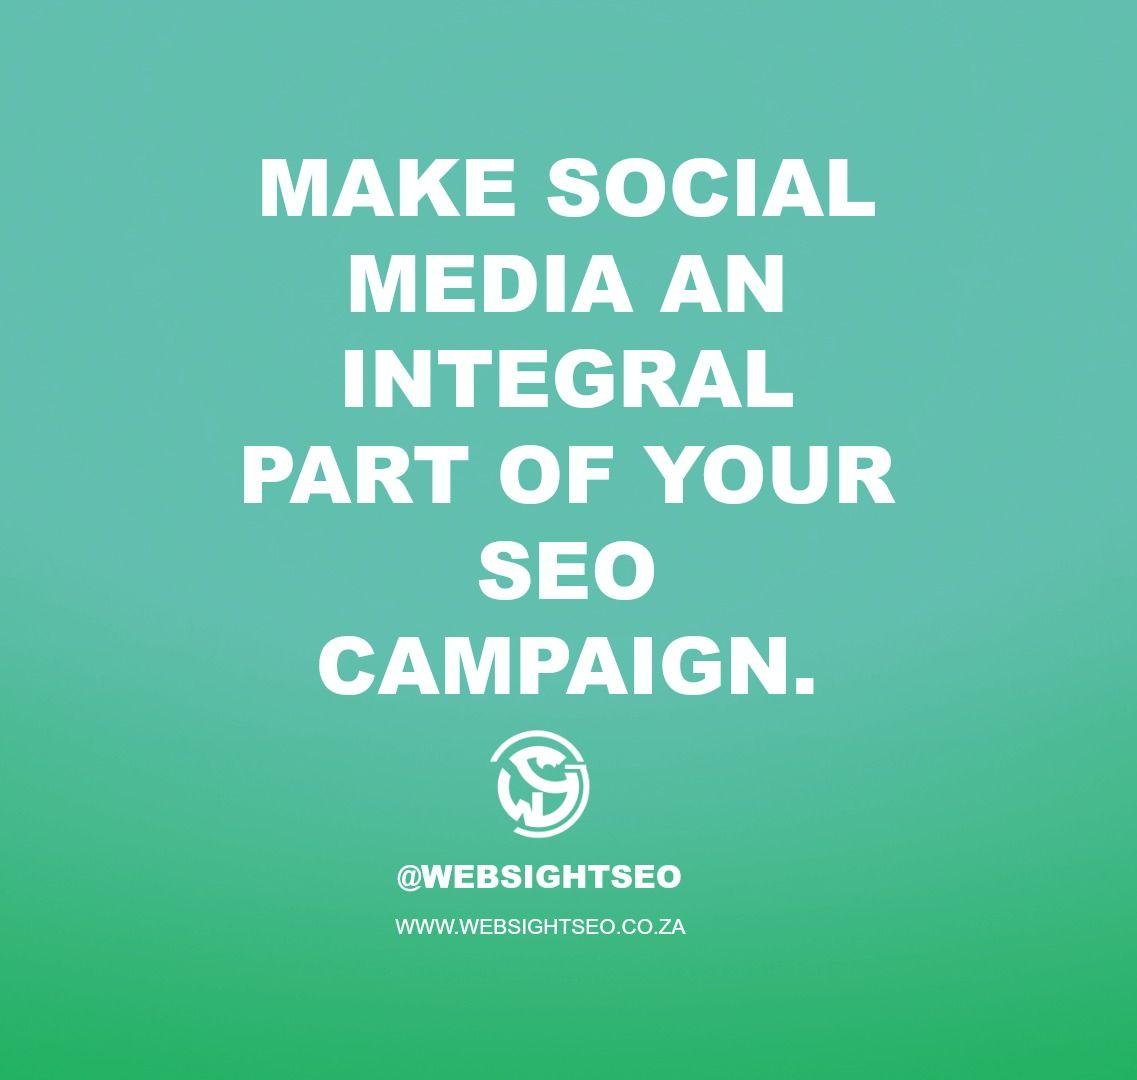 Make social media an integral part of your SEO campaign.  #WSSCPT #seo #seotips